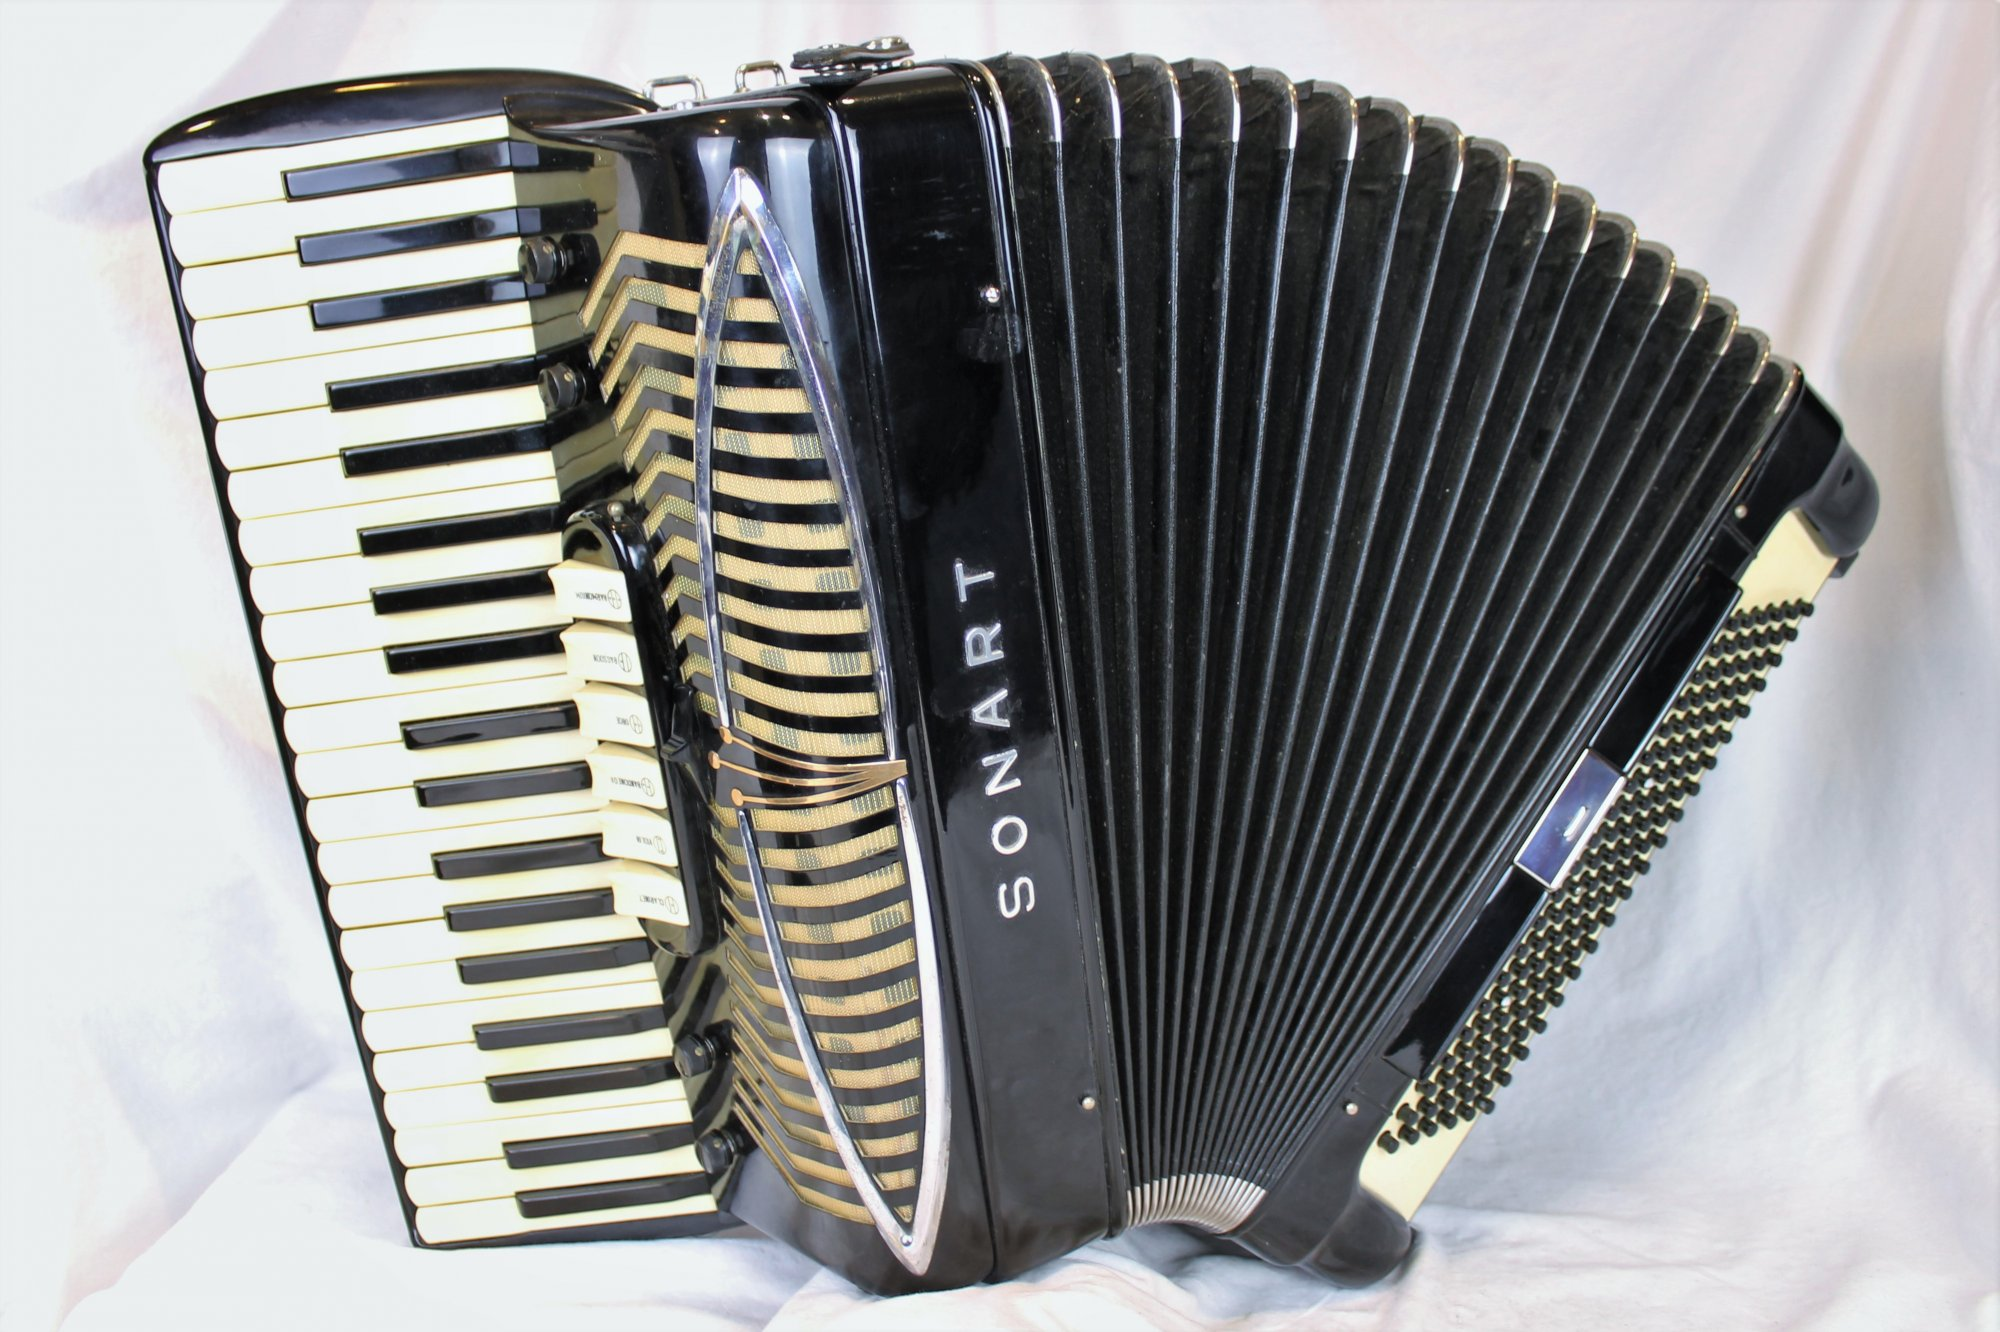 4756 - Black Sonola Sonart Symphony Artist C. 60 Piano Accordion LMM 41 120